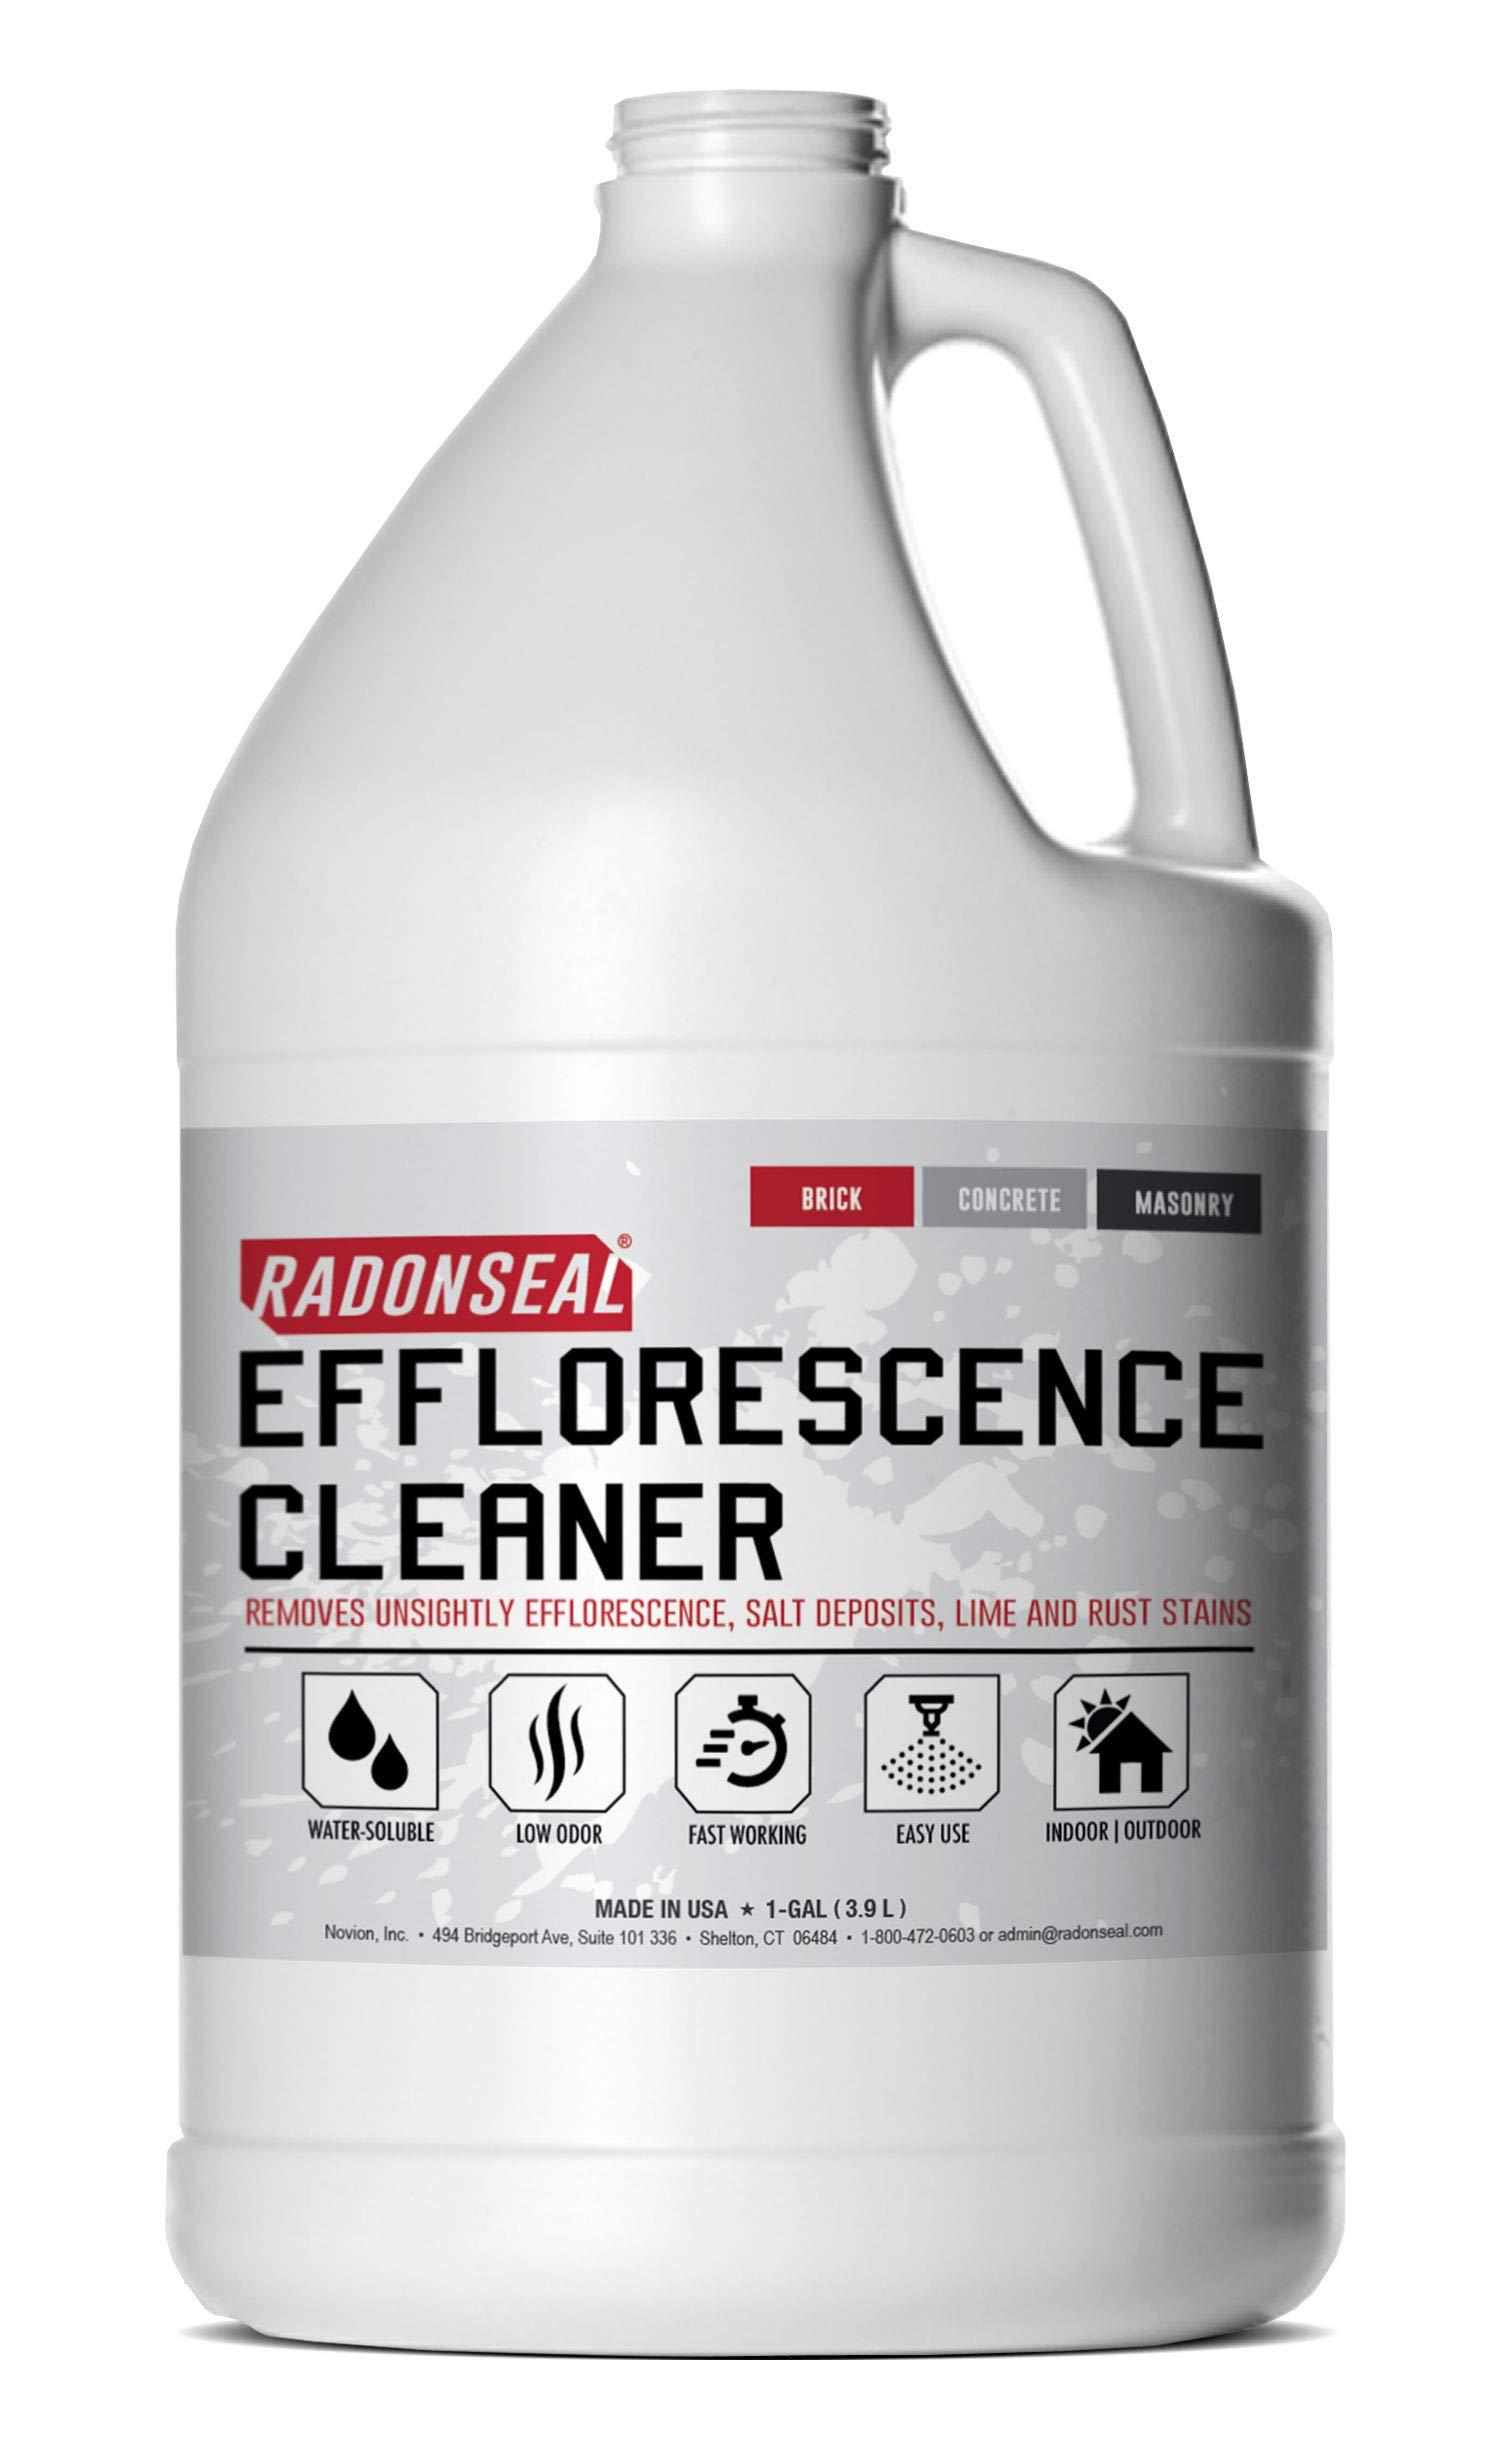 RadonSeal Efflorescence Remover - Cleans Efflorescence, Mortar Haze, Lime Deposits, and Rust Stains. No Odor, Safe for Use Indoors & Outdoors